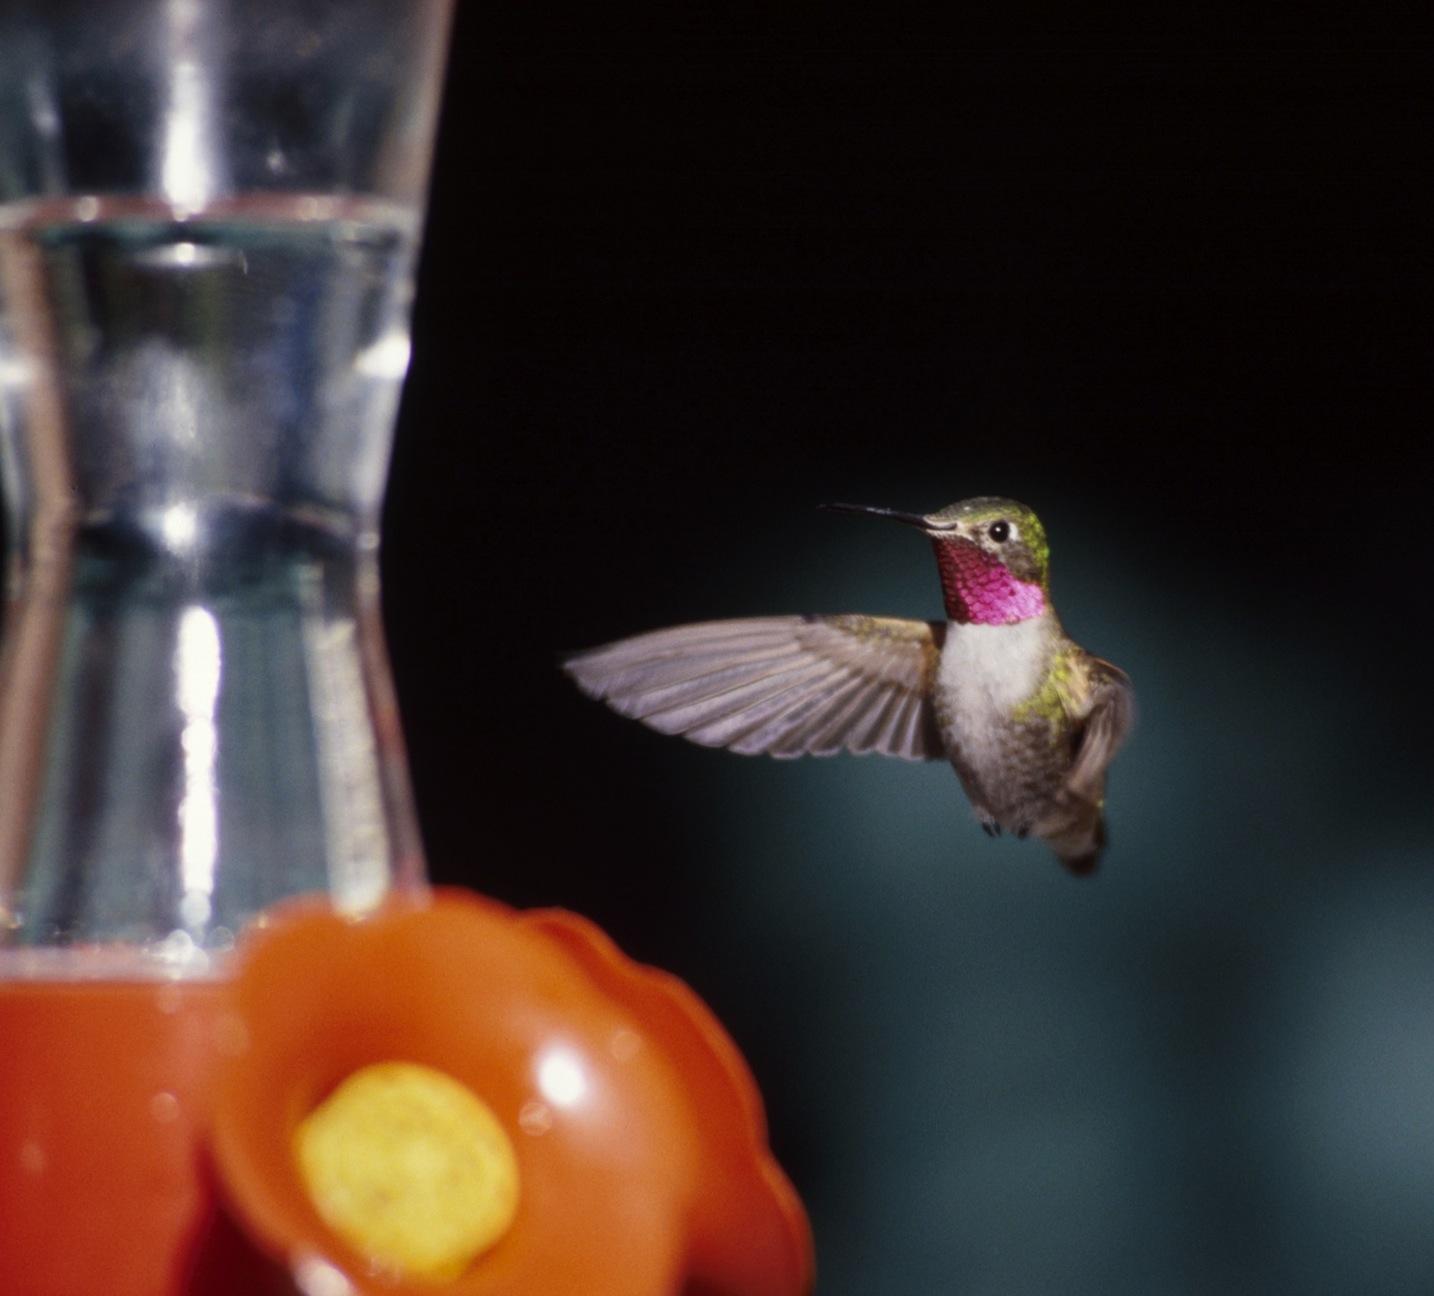 bethlehem birdman u0027s tips tips for attracting hummingbirds to your